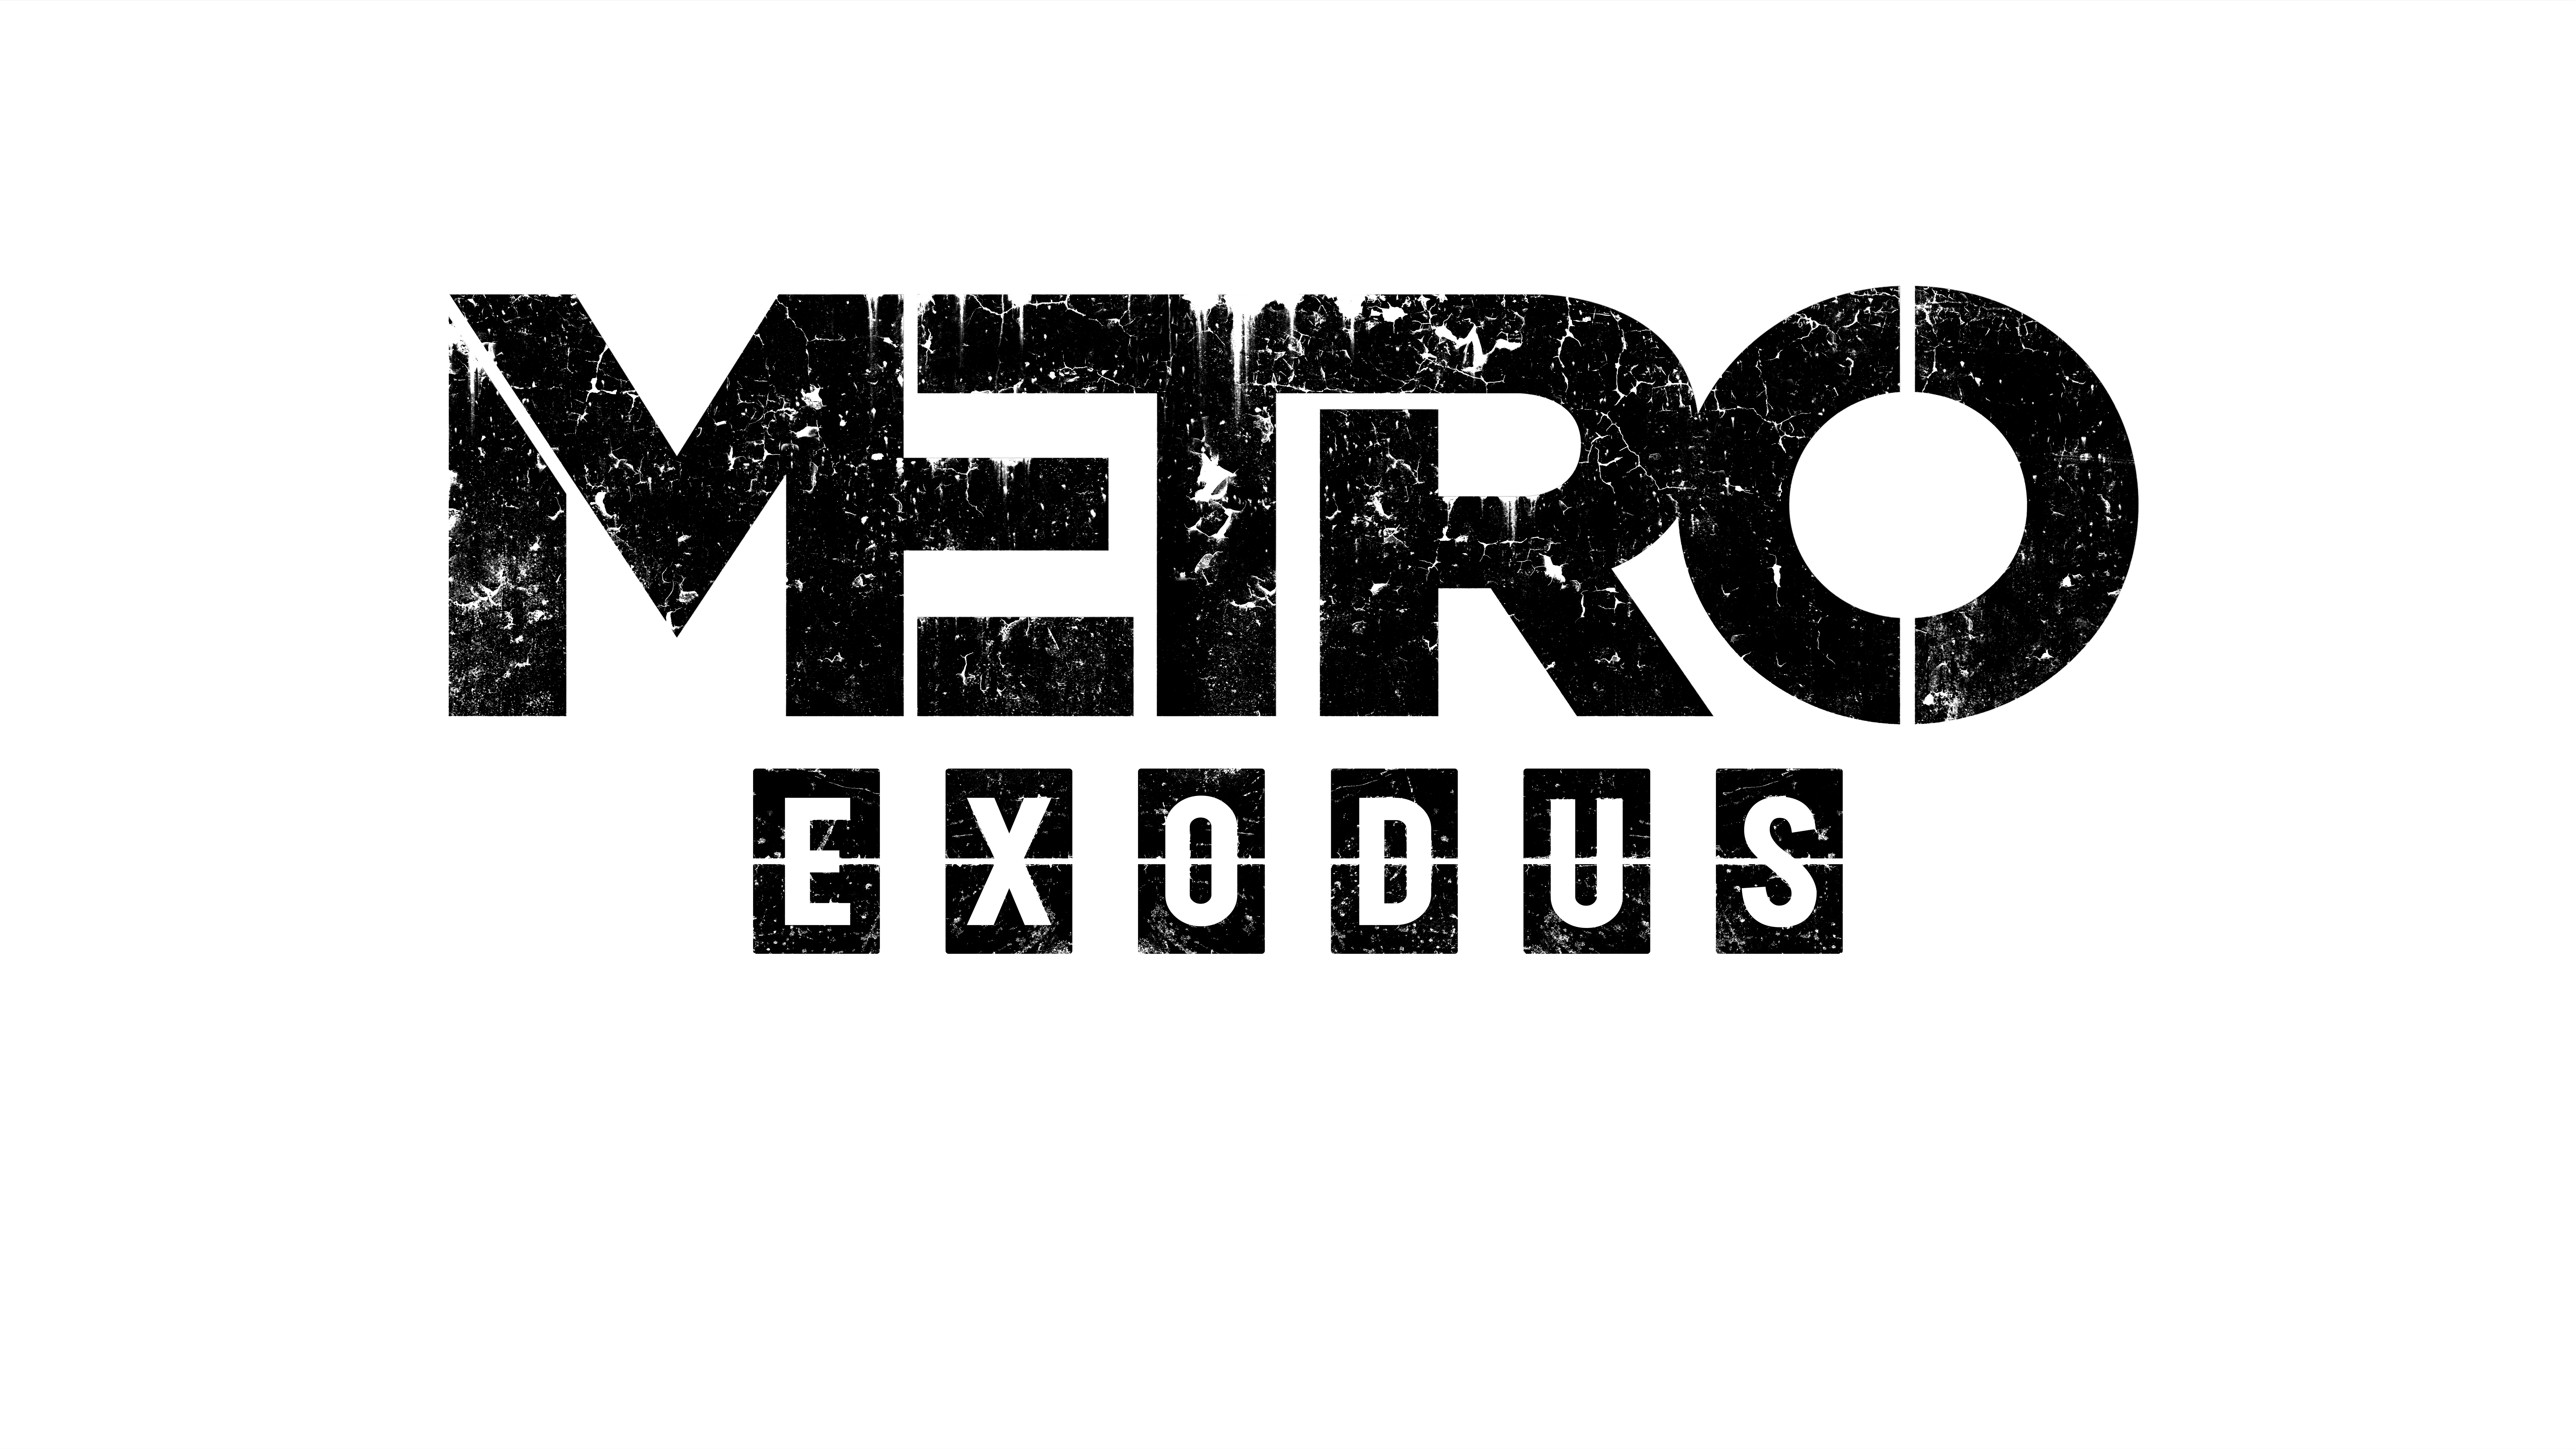 Dragon Gaming Clan Mascot Avatar Free logo, Avatar, Games